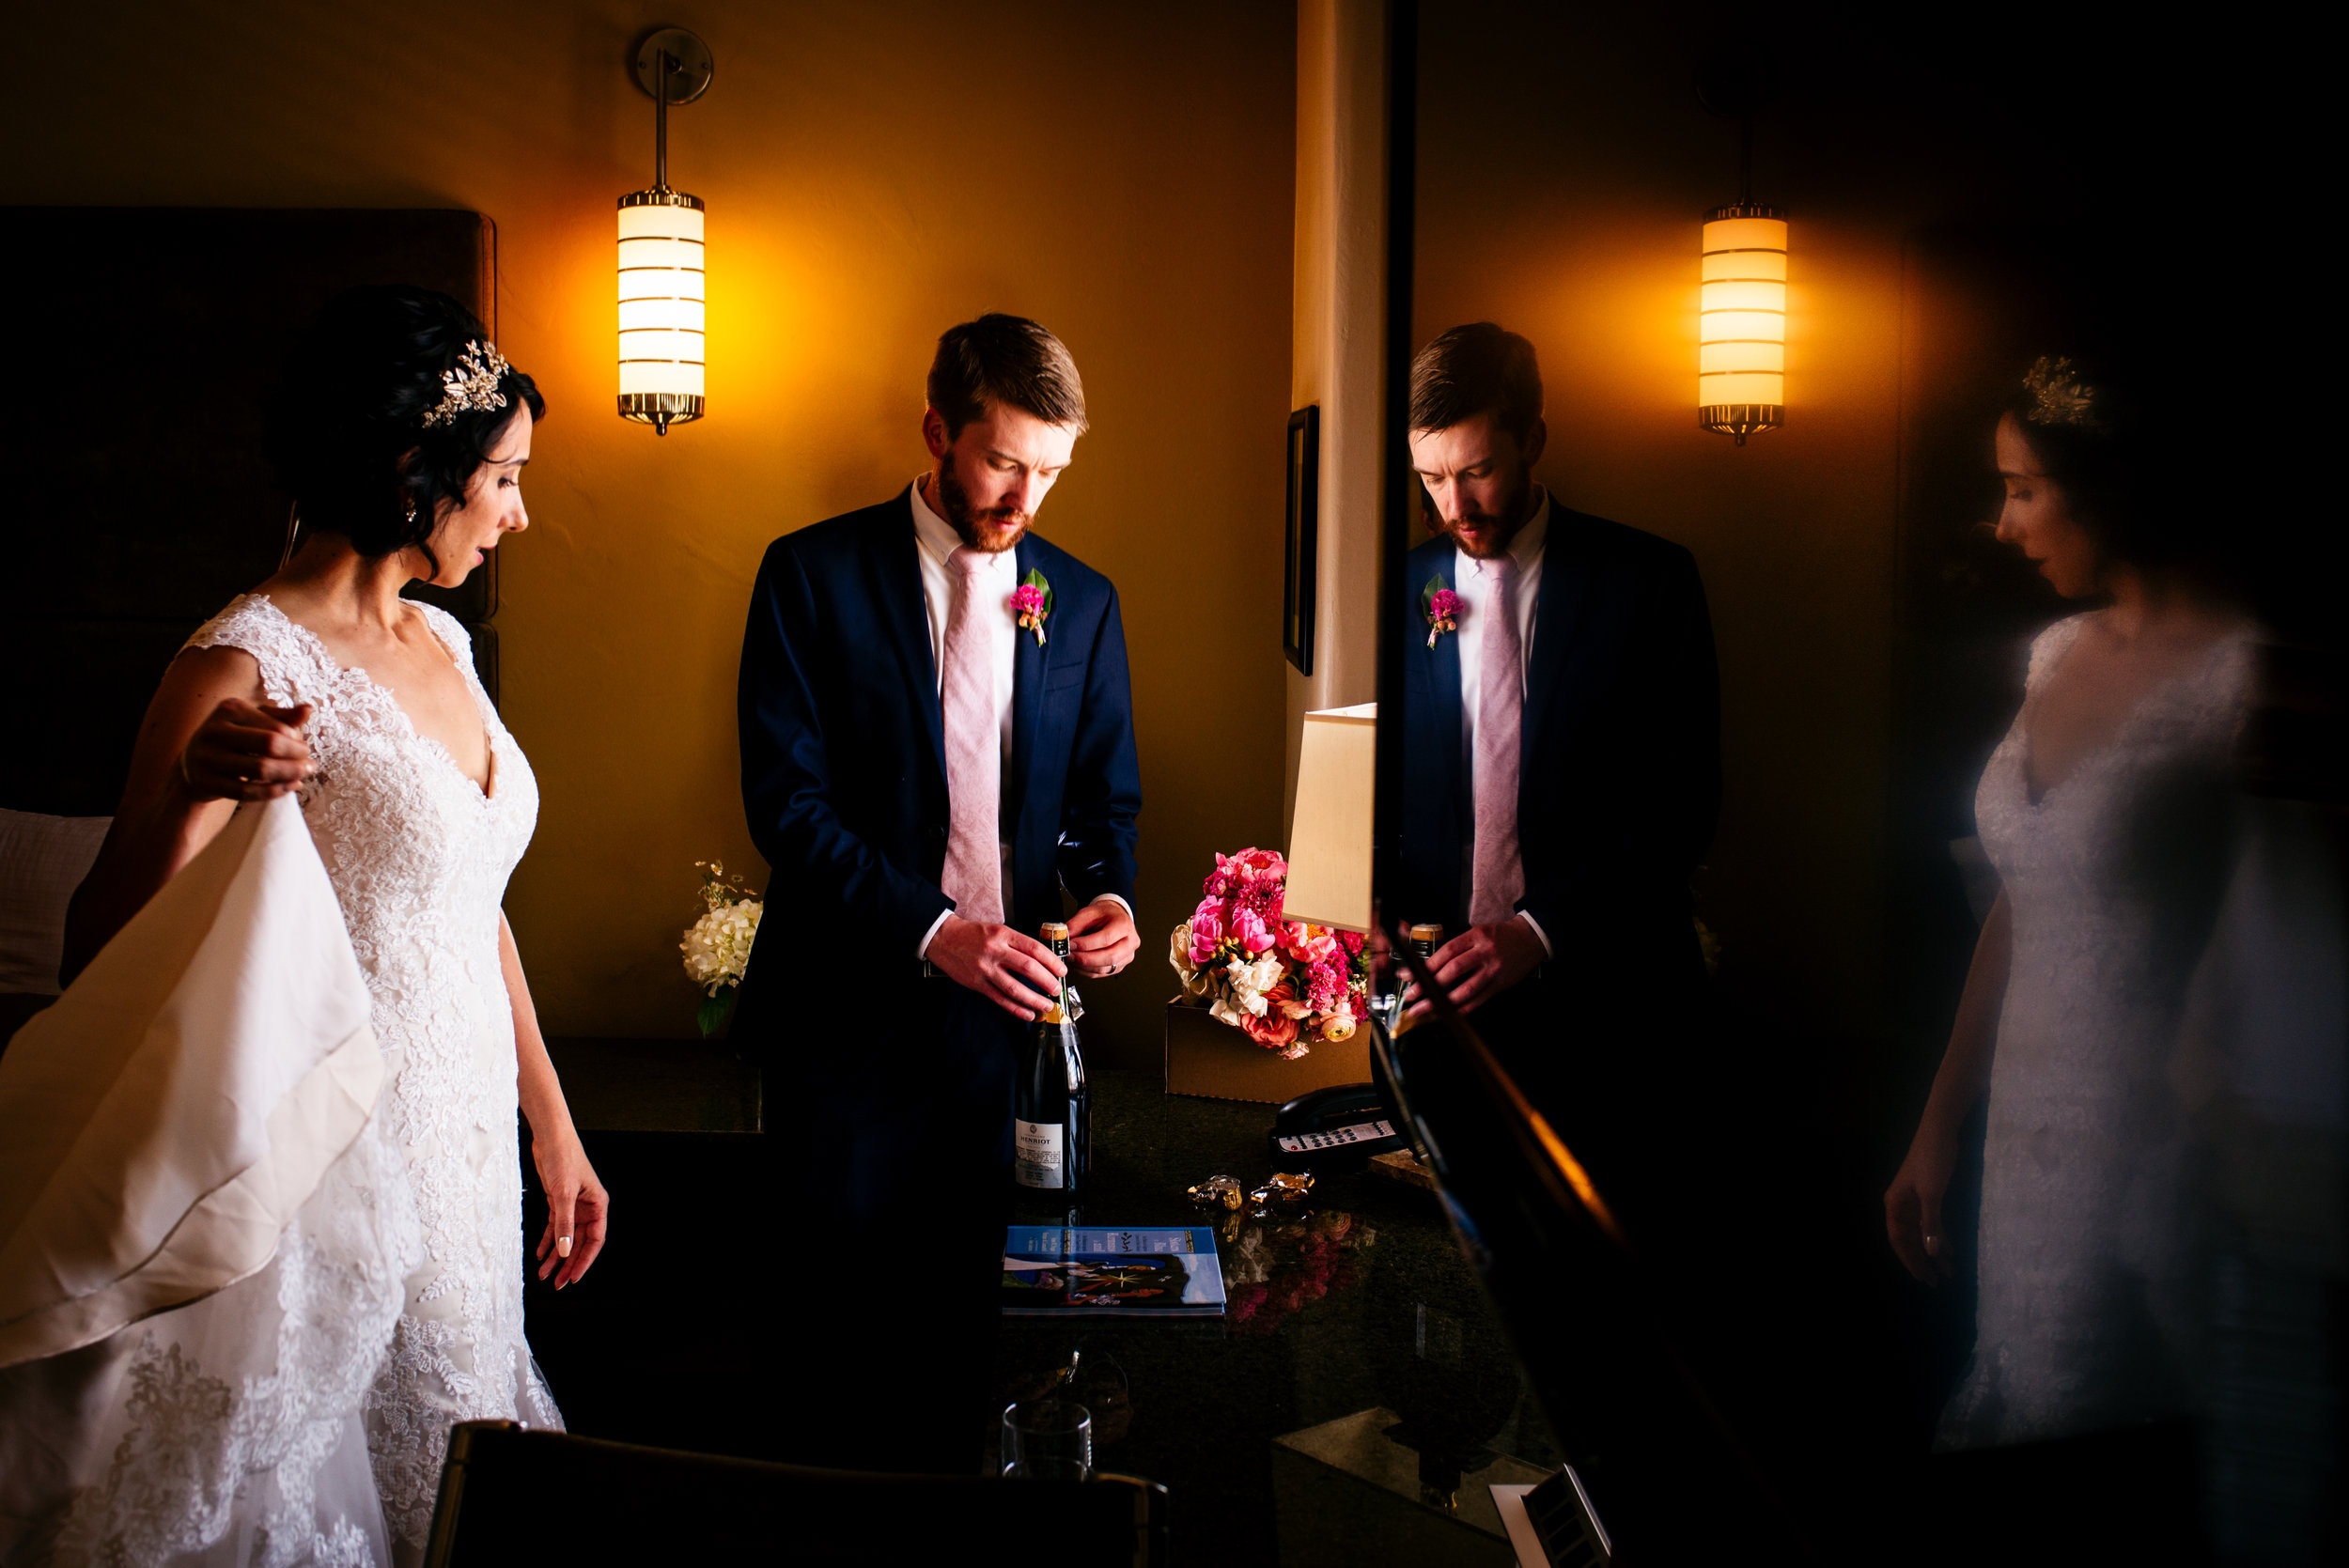 Extended_Play_Photography_Carmella_Wedding-13.jpg